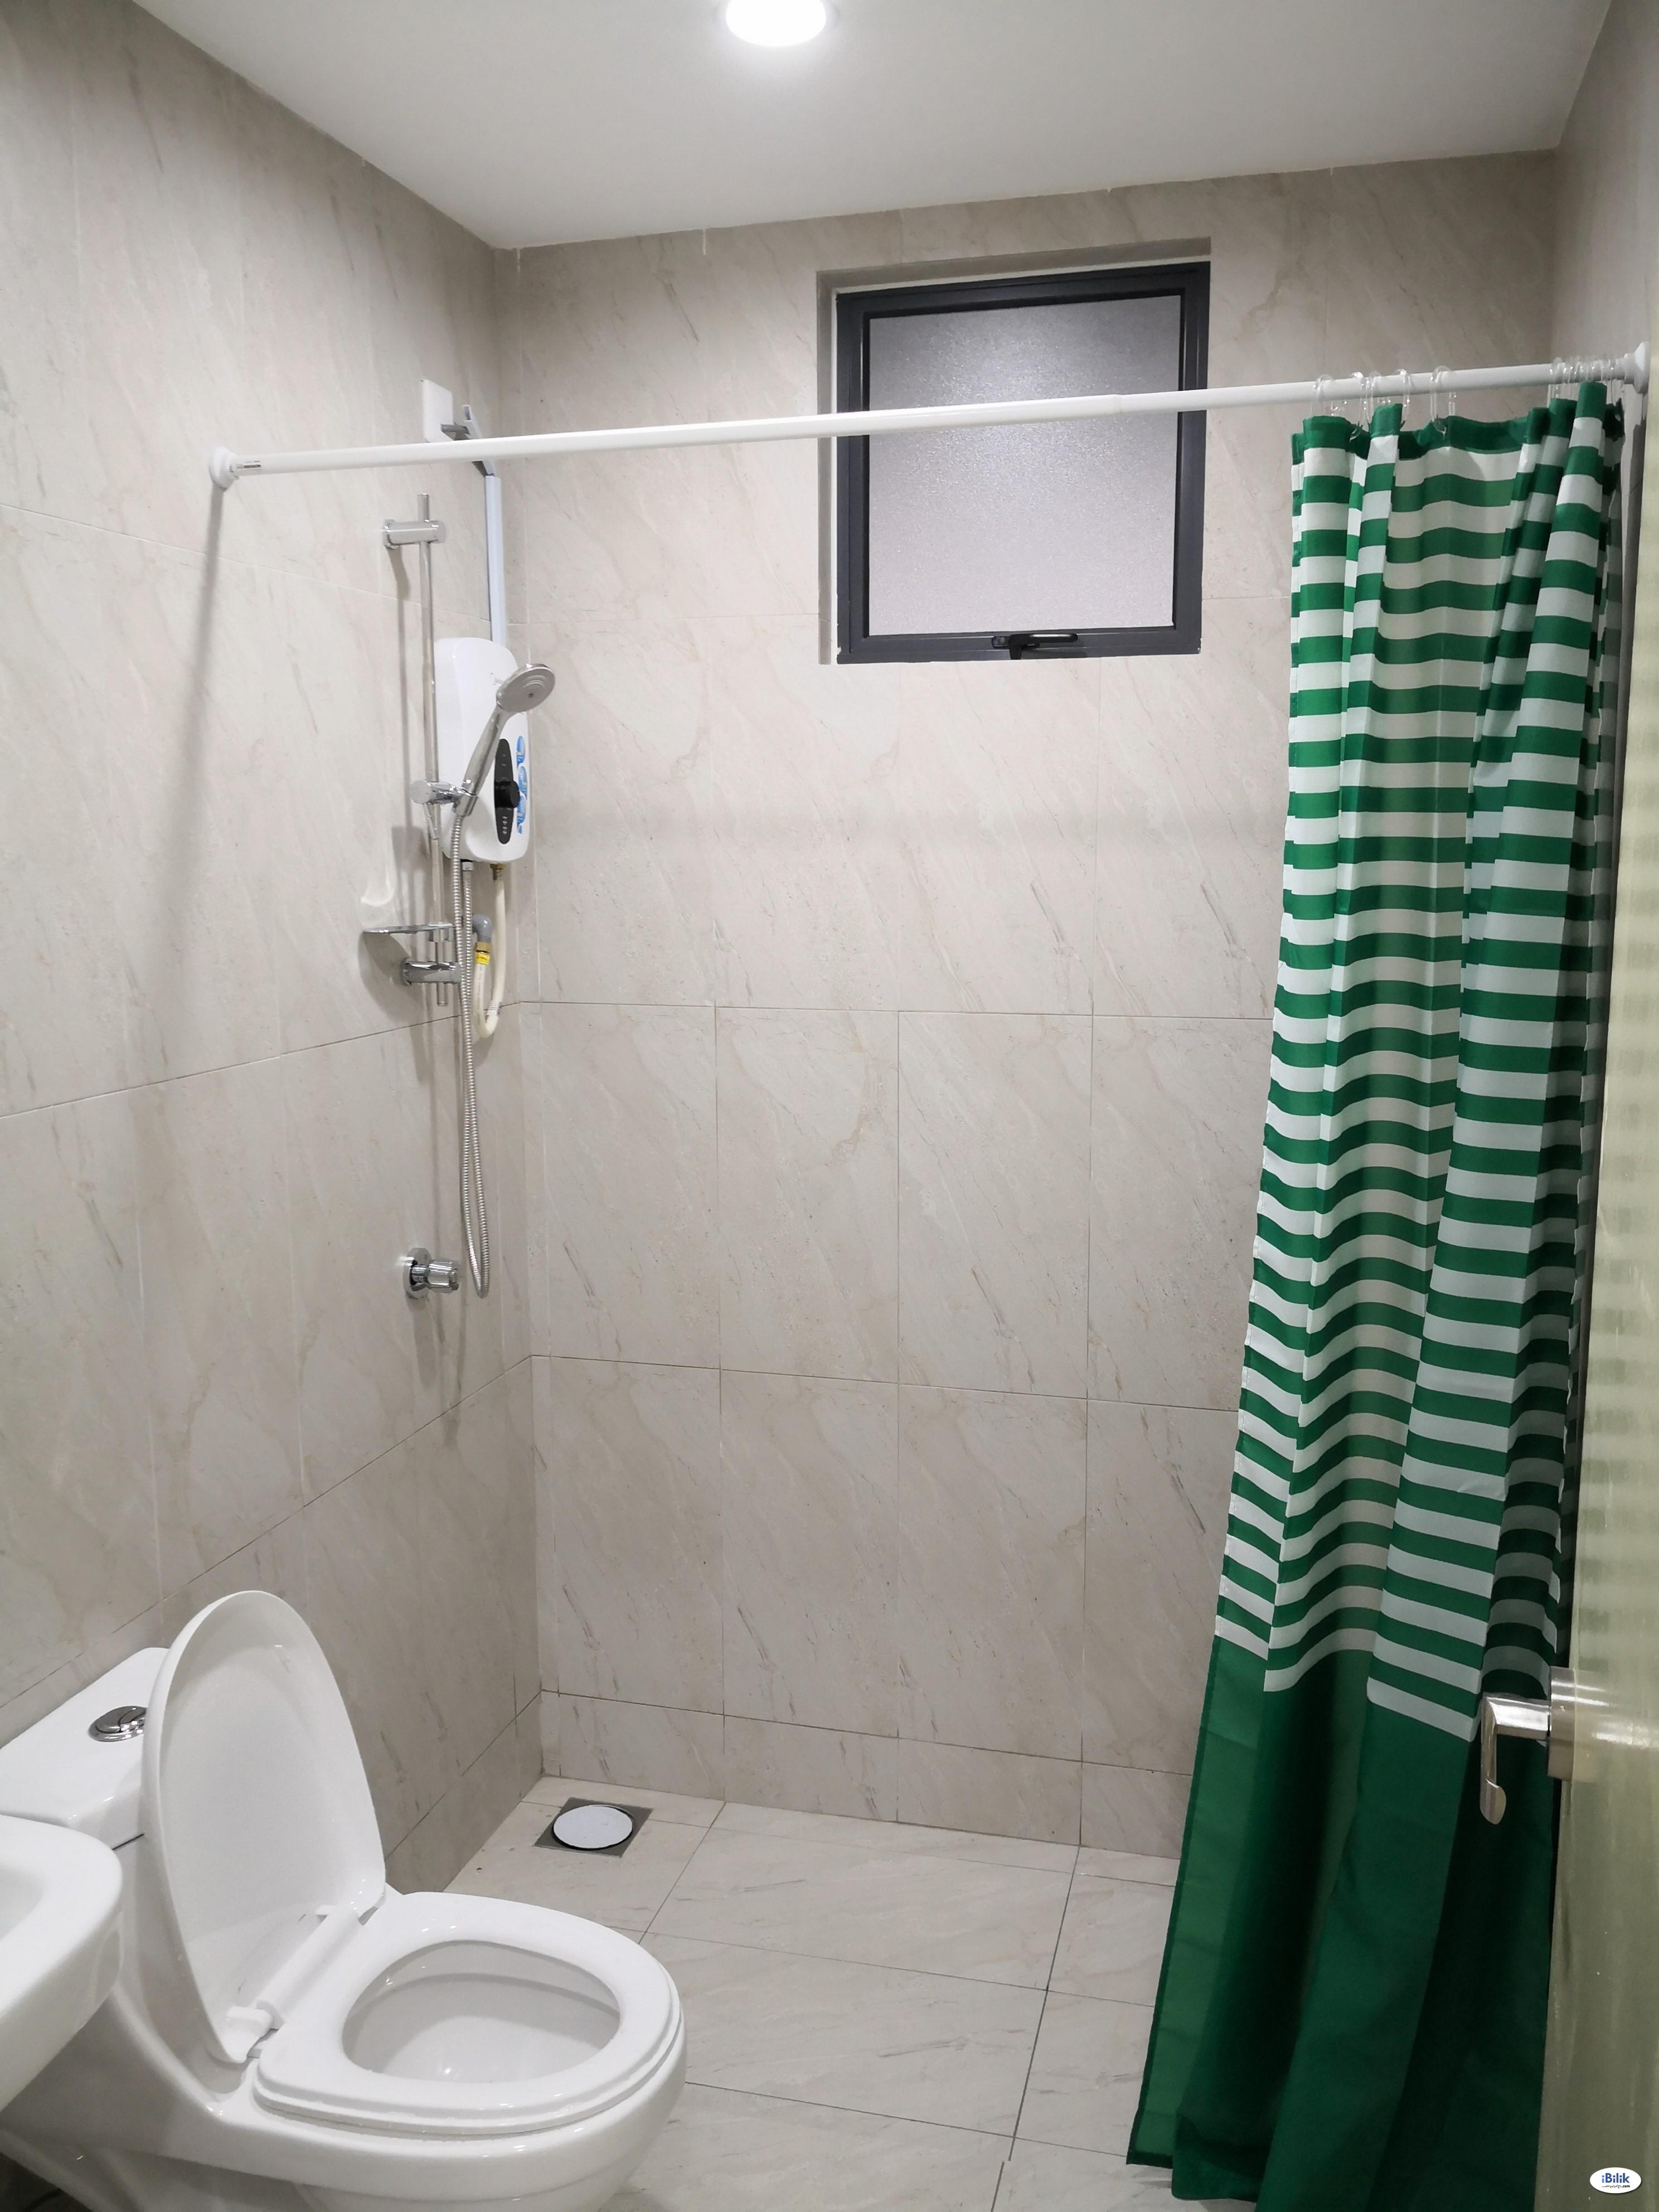 Single Room at The Hamilton, Wangsa Maju